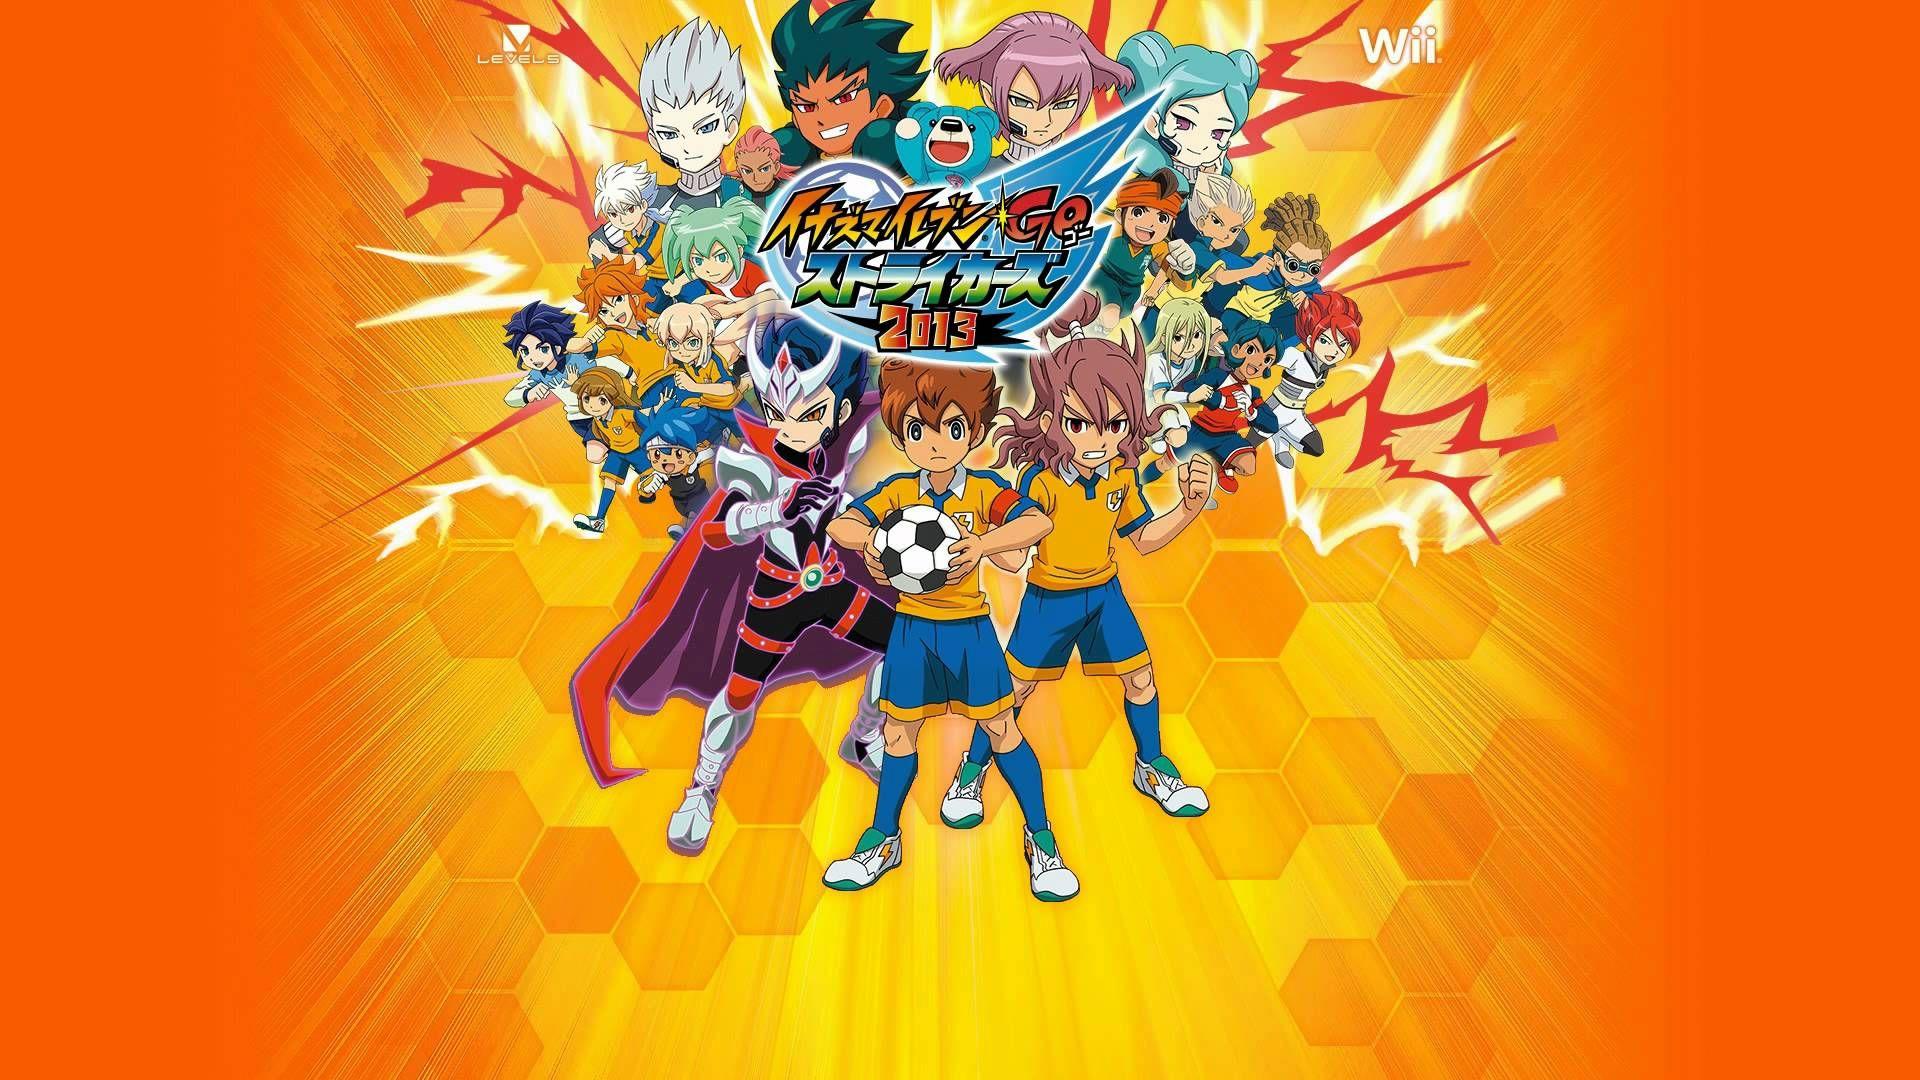 Inazuma Eleven Go Strikers 2013 Ost Beta S Theme Anime Images Eleventh Theme